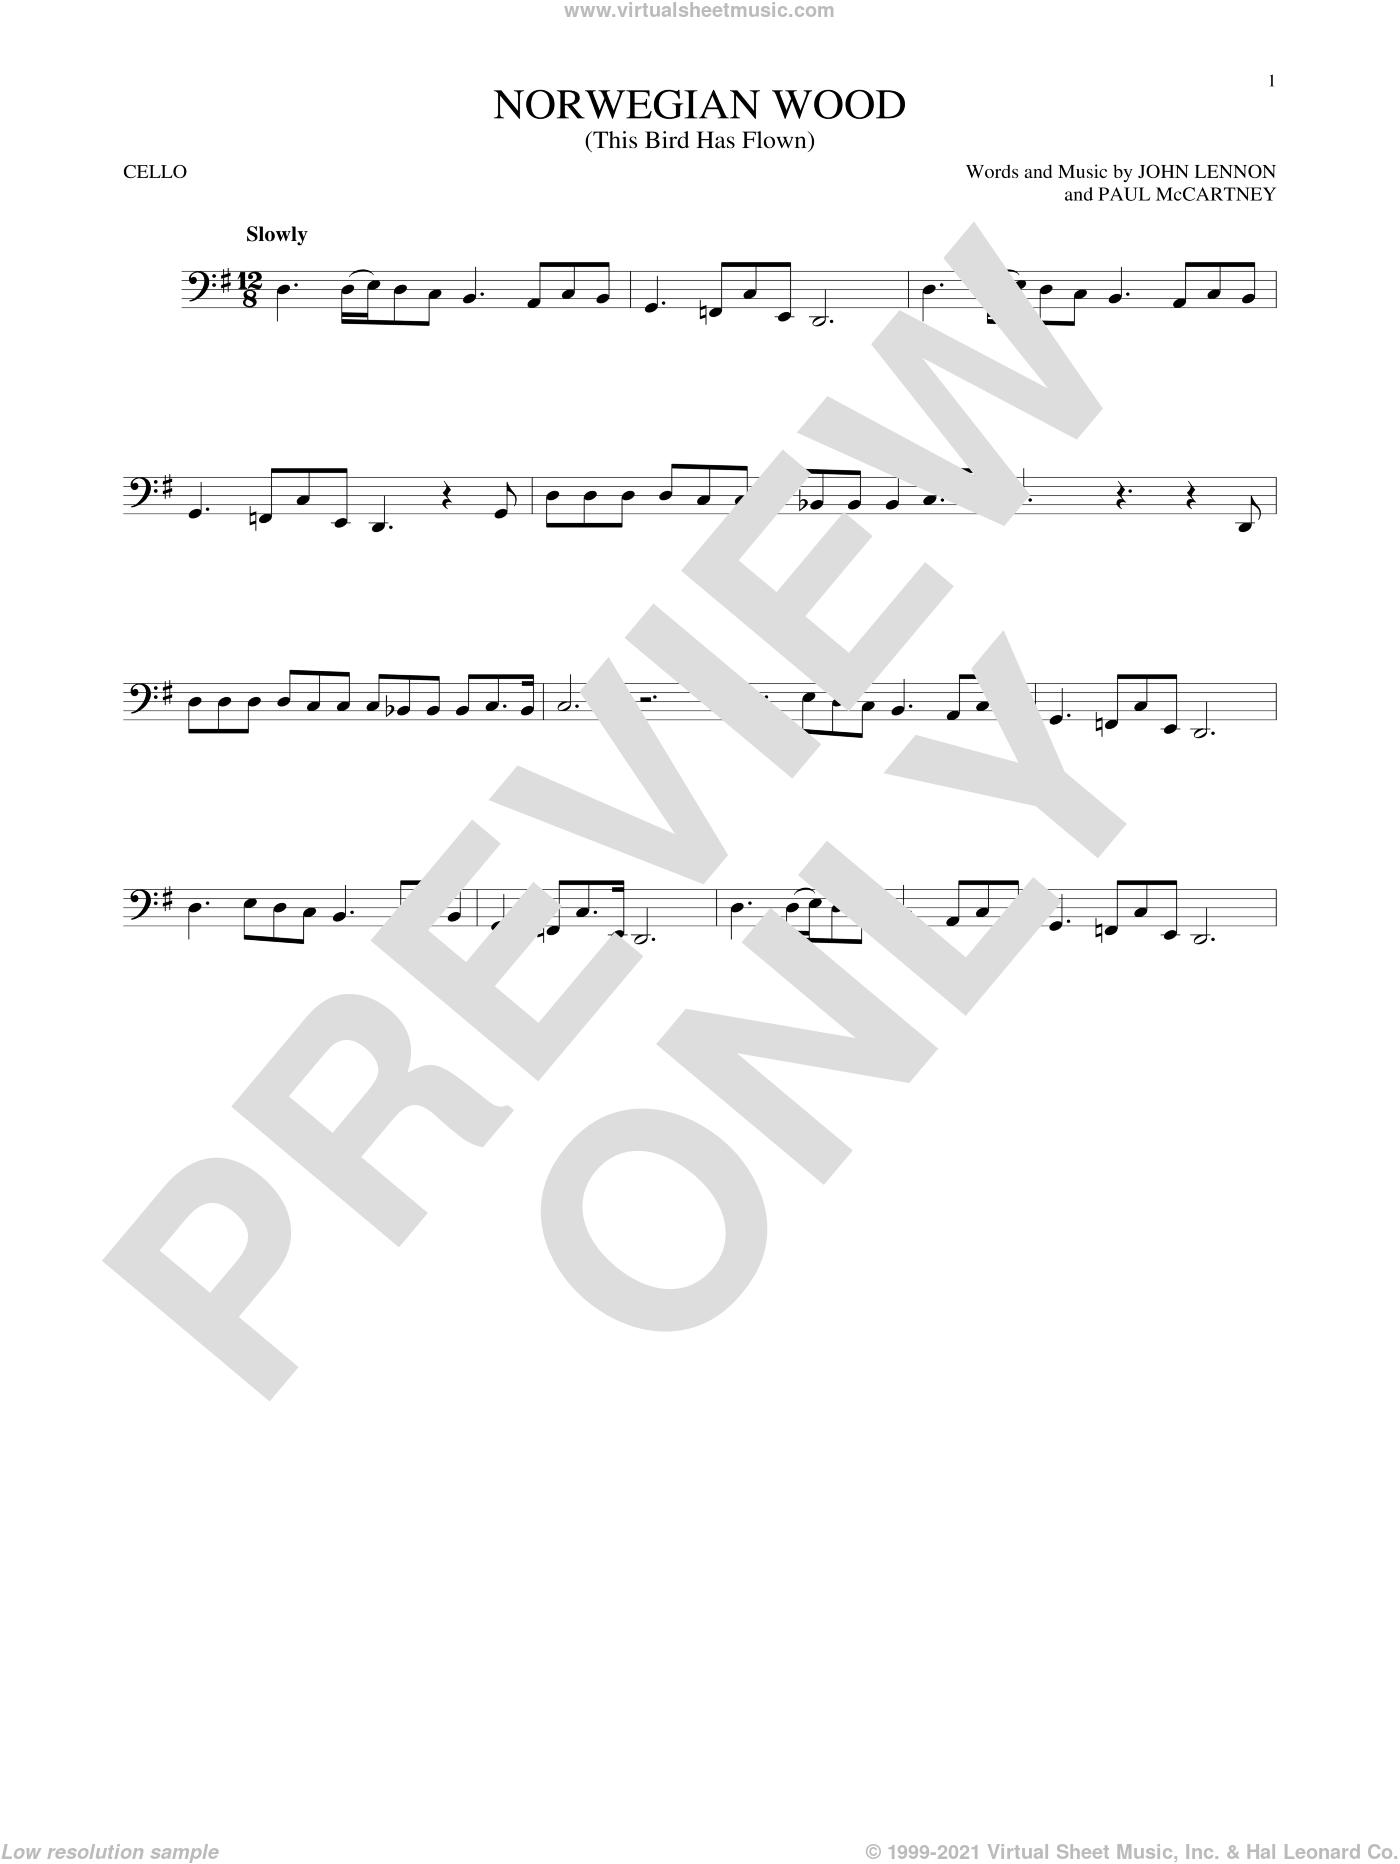 Norwegian Wood (This Bird Has Flown) sheet music for cello solo by The Beatles, John Lennon and Paul McCartney, intermediate skill level